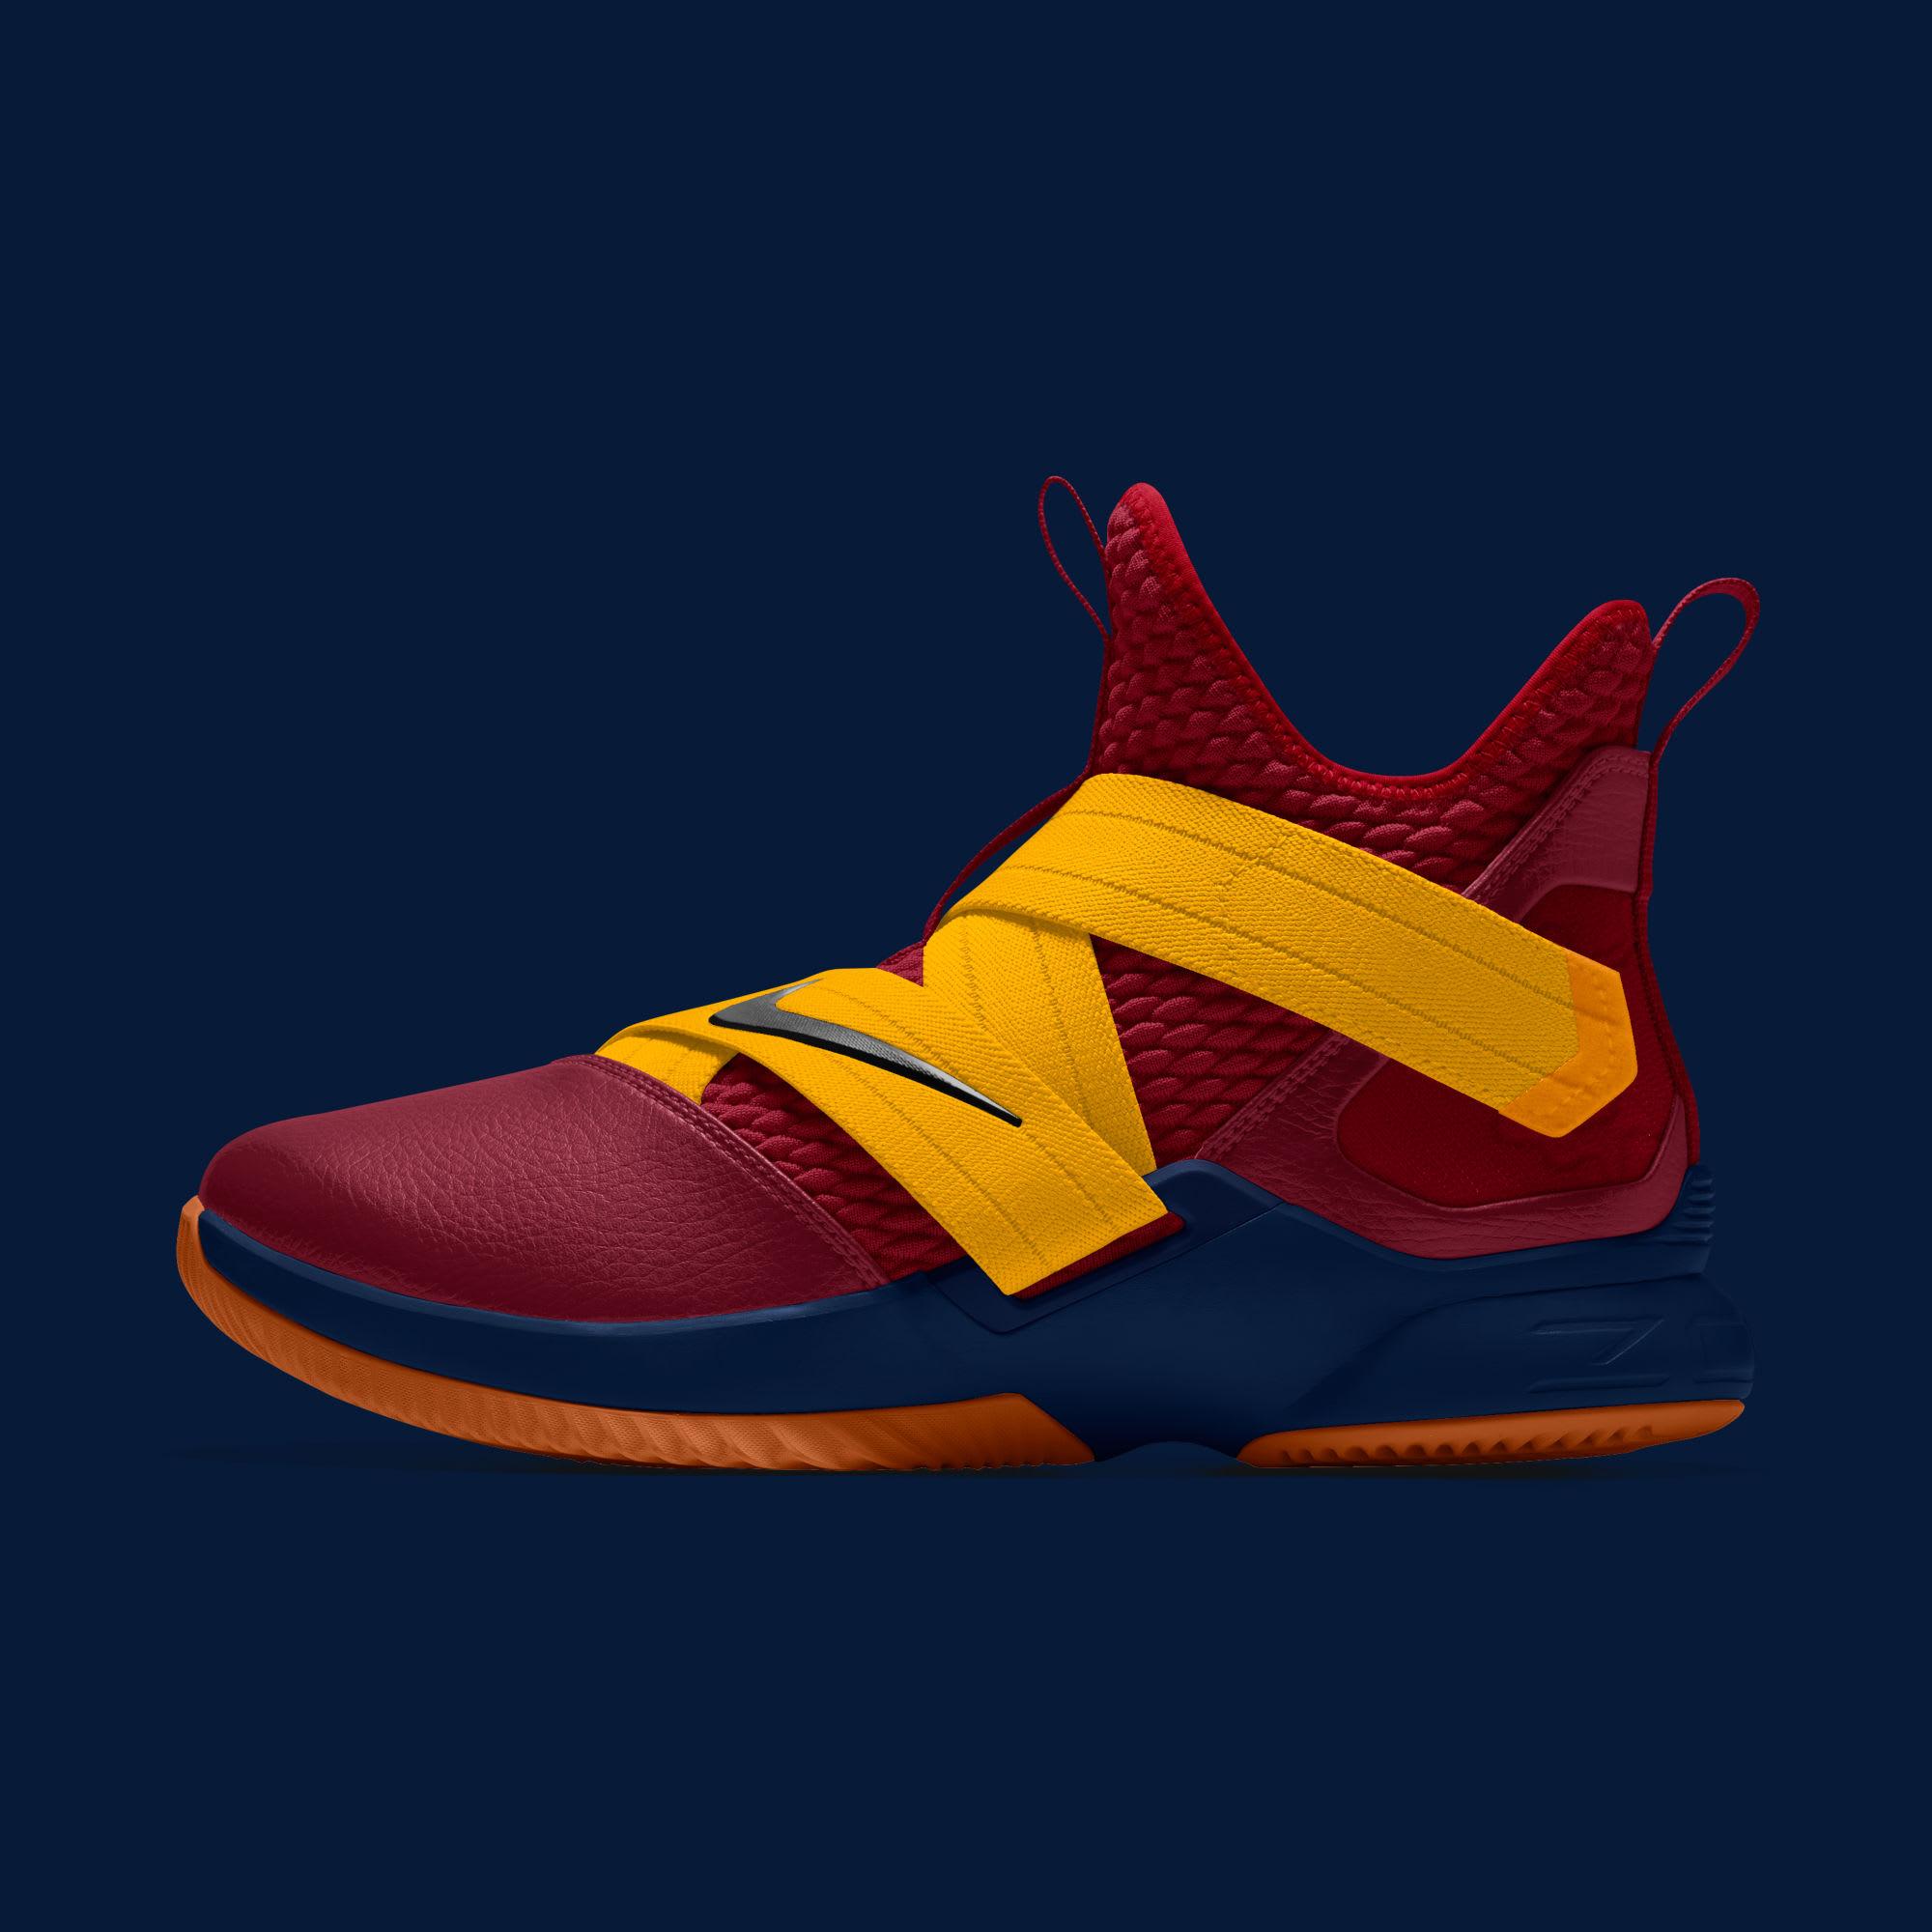 sneakers for cheap 8d025 53b22 NIKEiD LeBron Soldier 12 XII Release Date - Premier Kicks